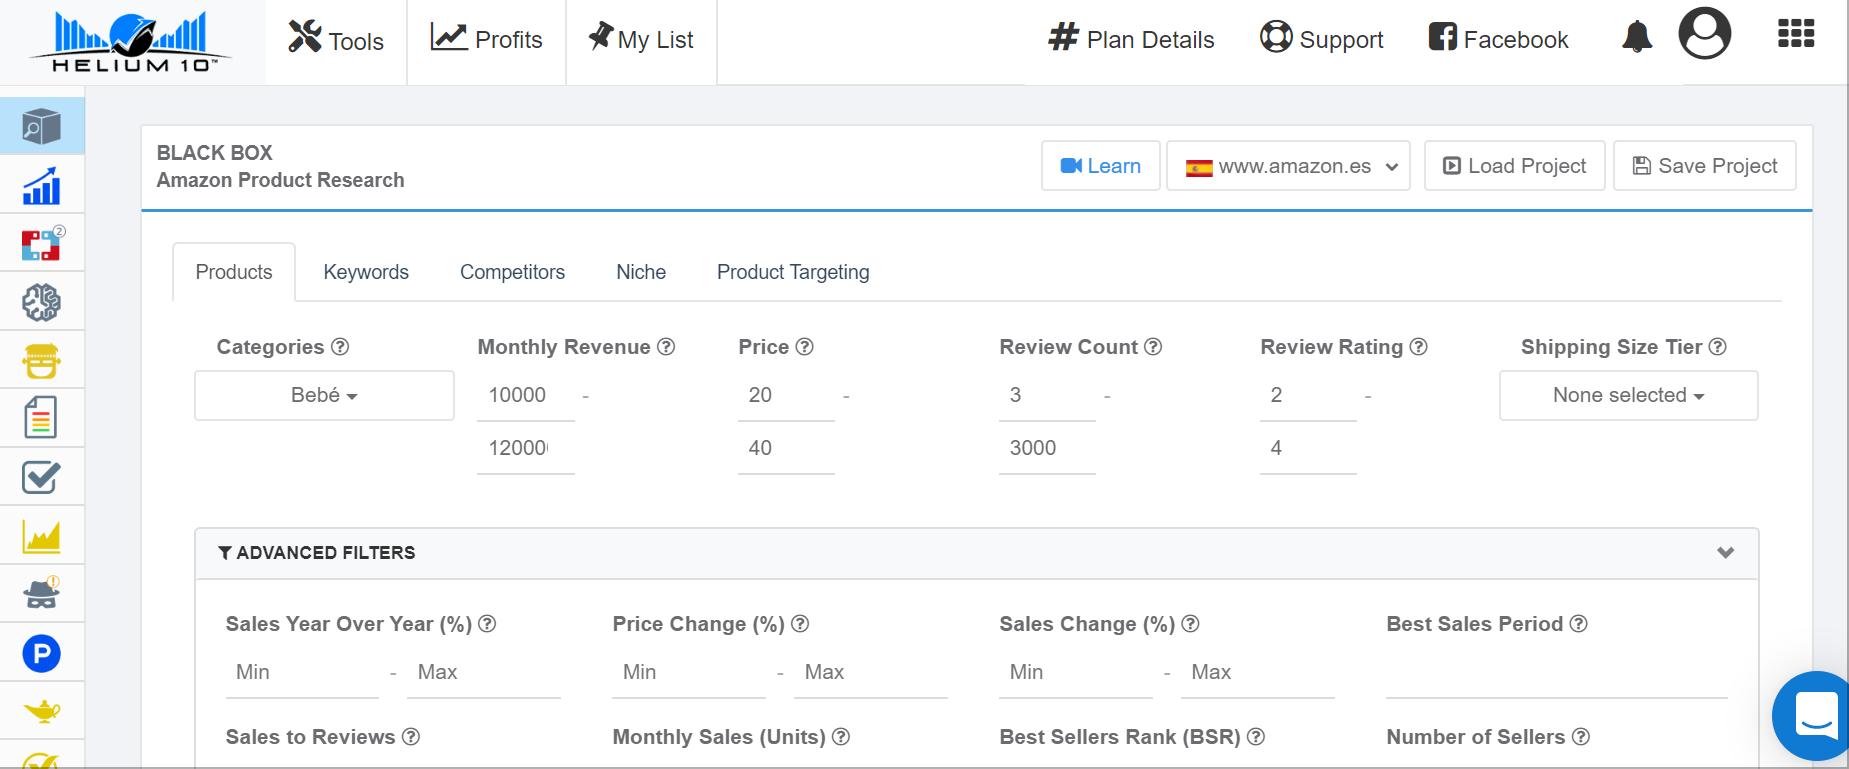 helium-10-review-blackbox-herramienta-marketing-amazon